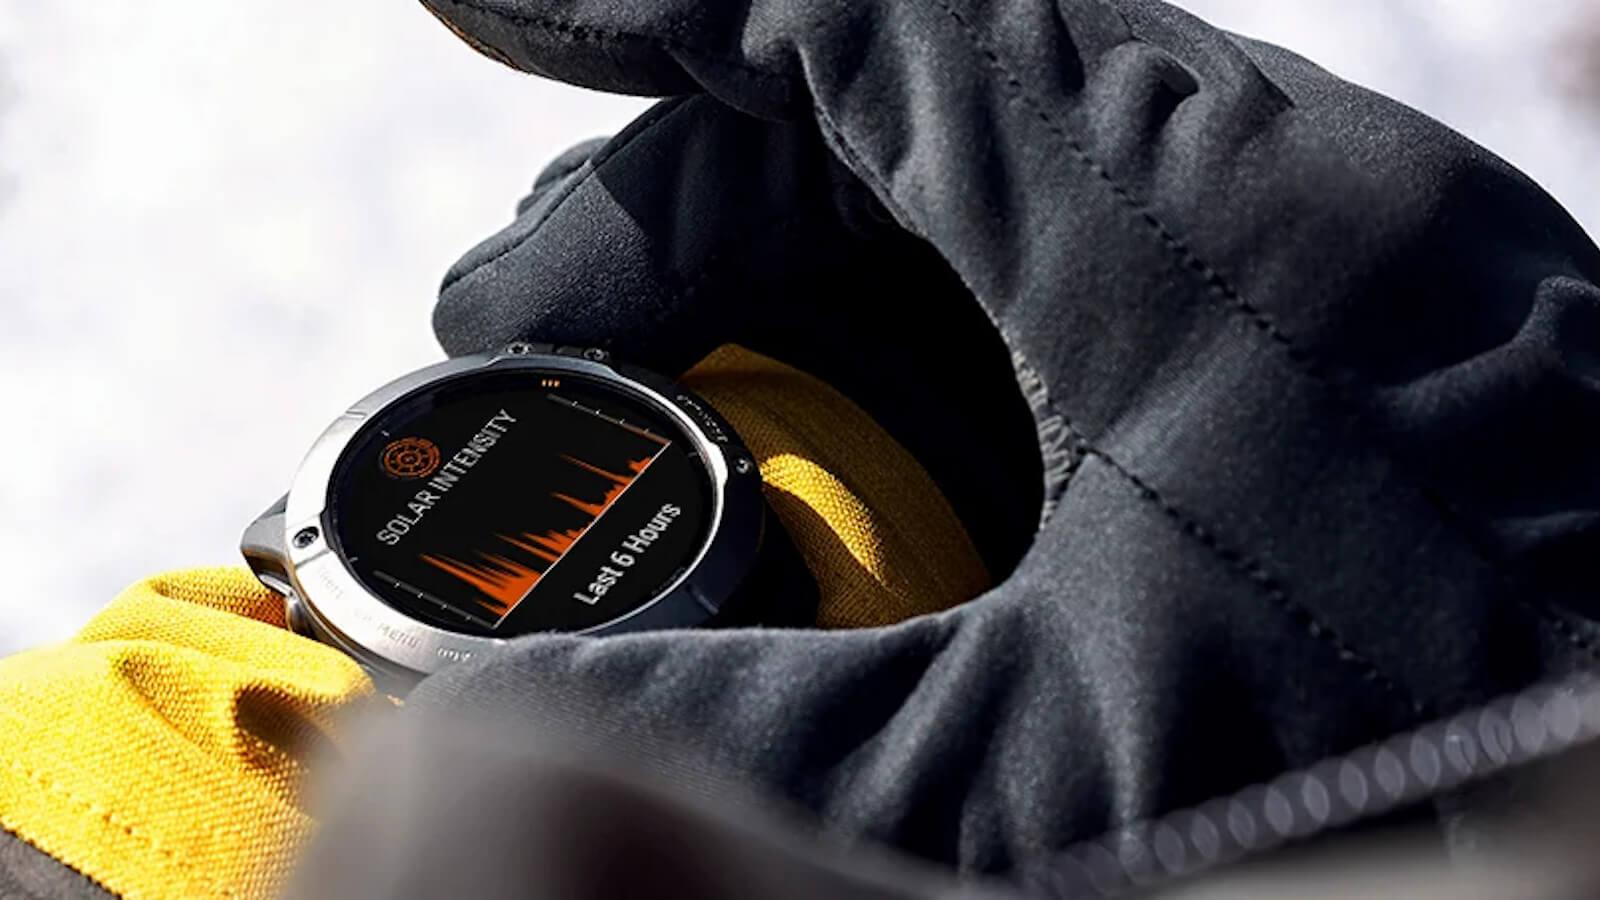 Garmin fēnix 6 Series GPS Smartwatches